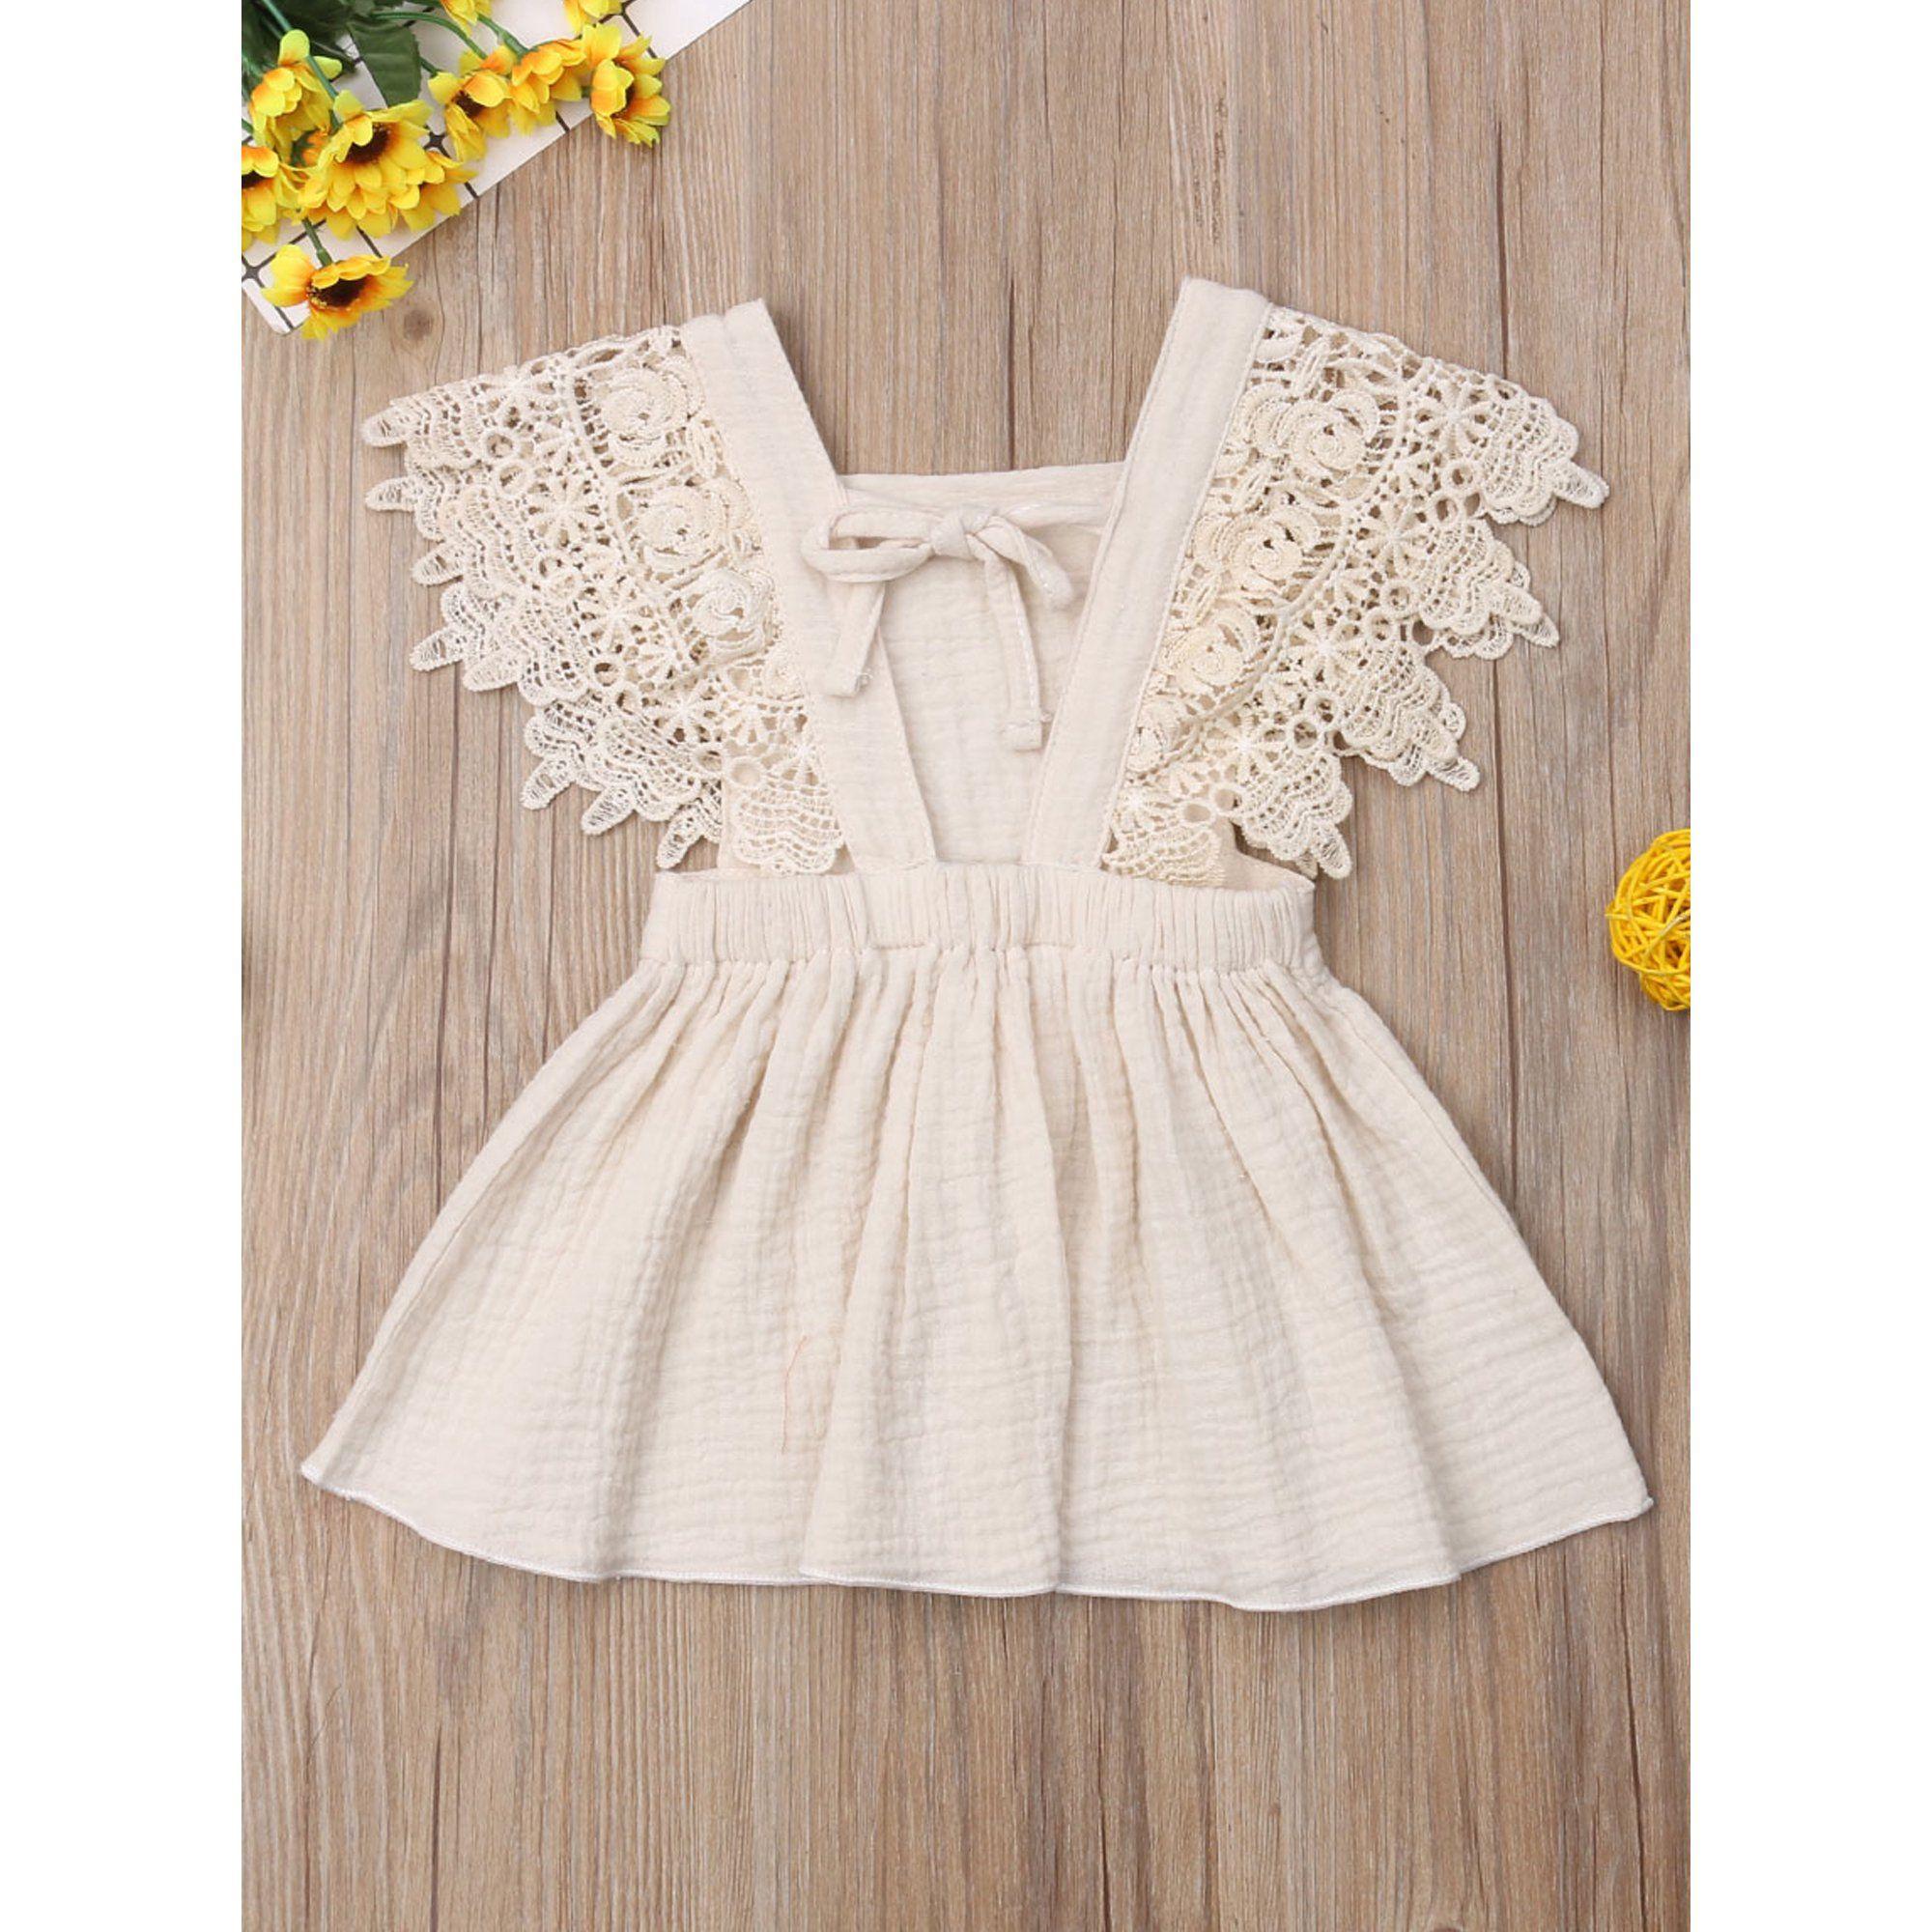 LisenraIn - Toddler Baby Girl Infant Comfy Cotton Linen Lace